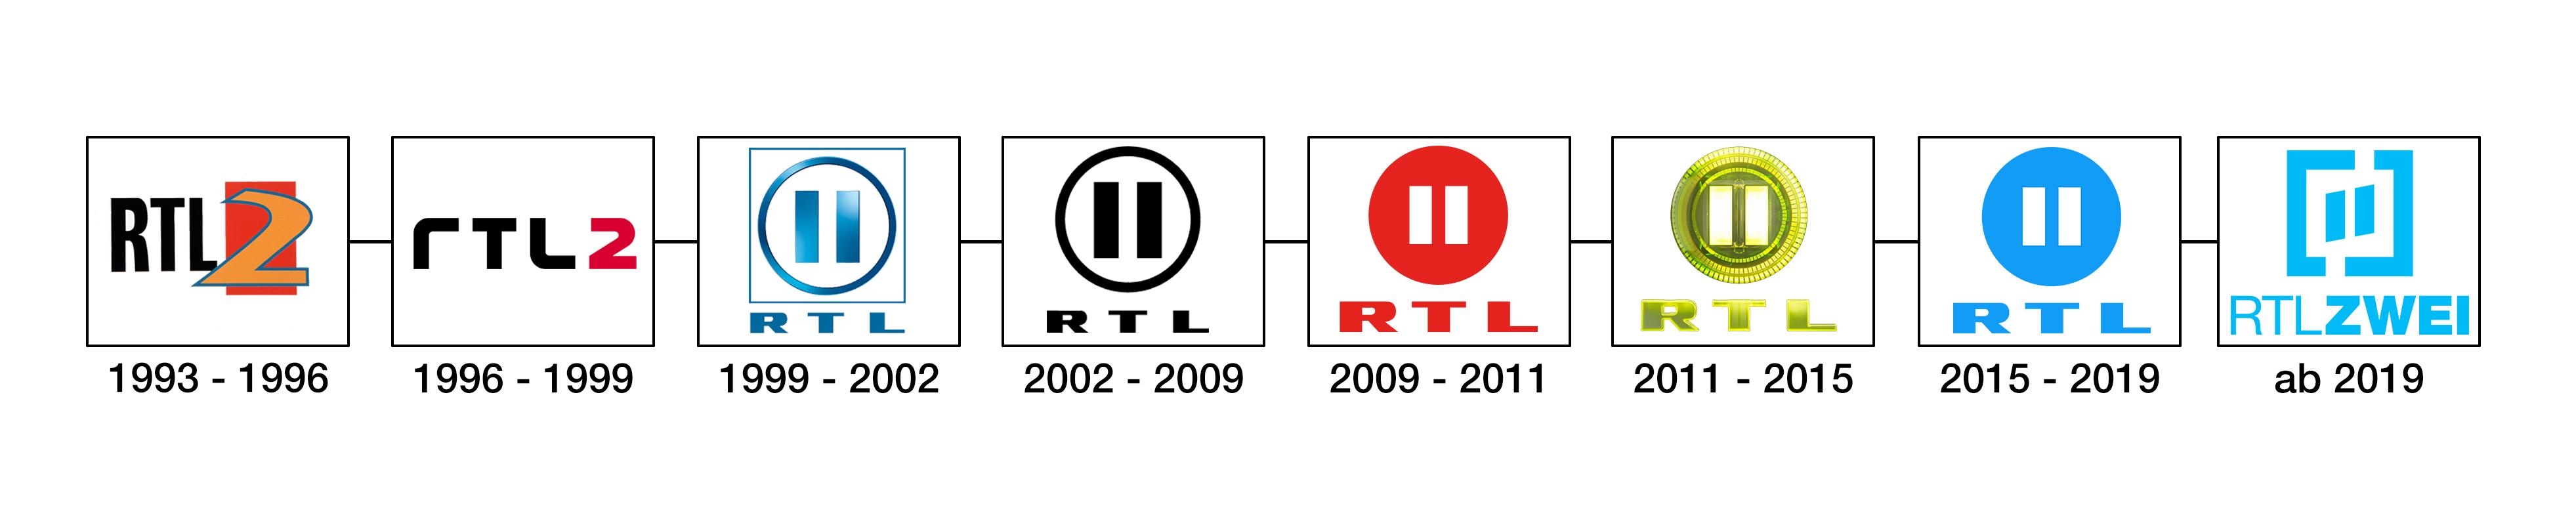 RTLZWEI_Logo-Historie